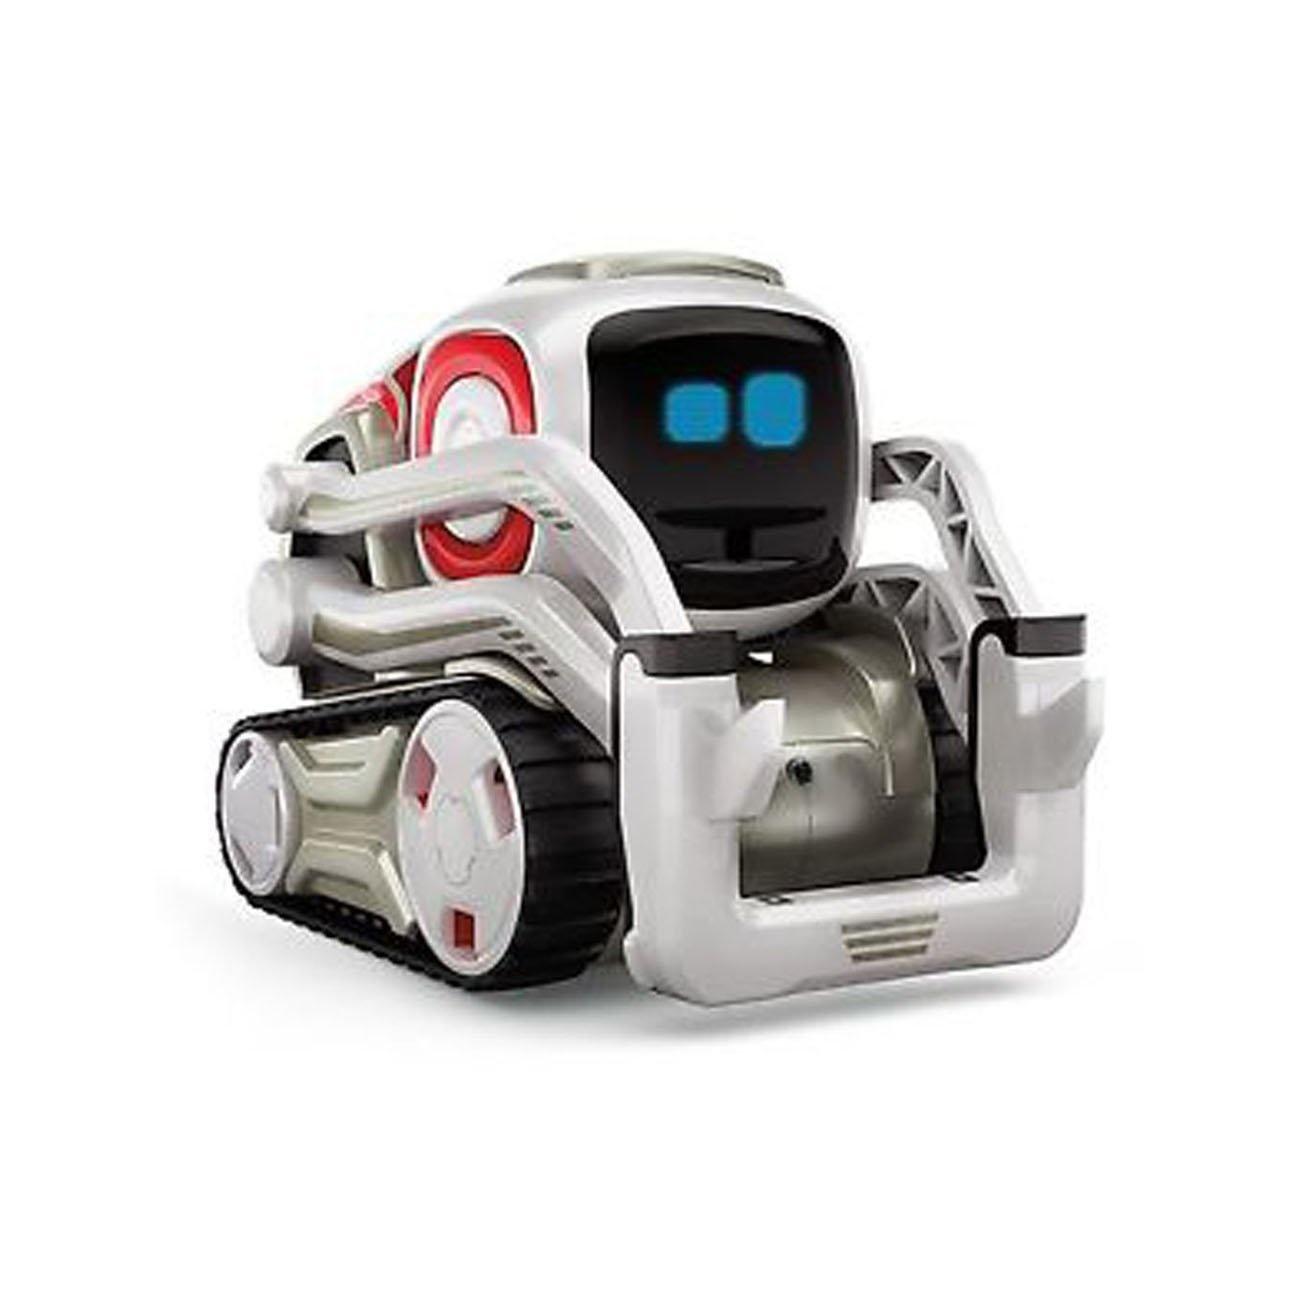 U Robots Buy Online From Makeblock Female Rod End Bearingthree Pack